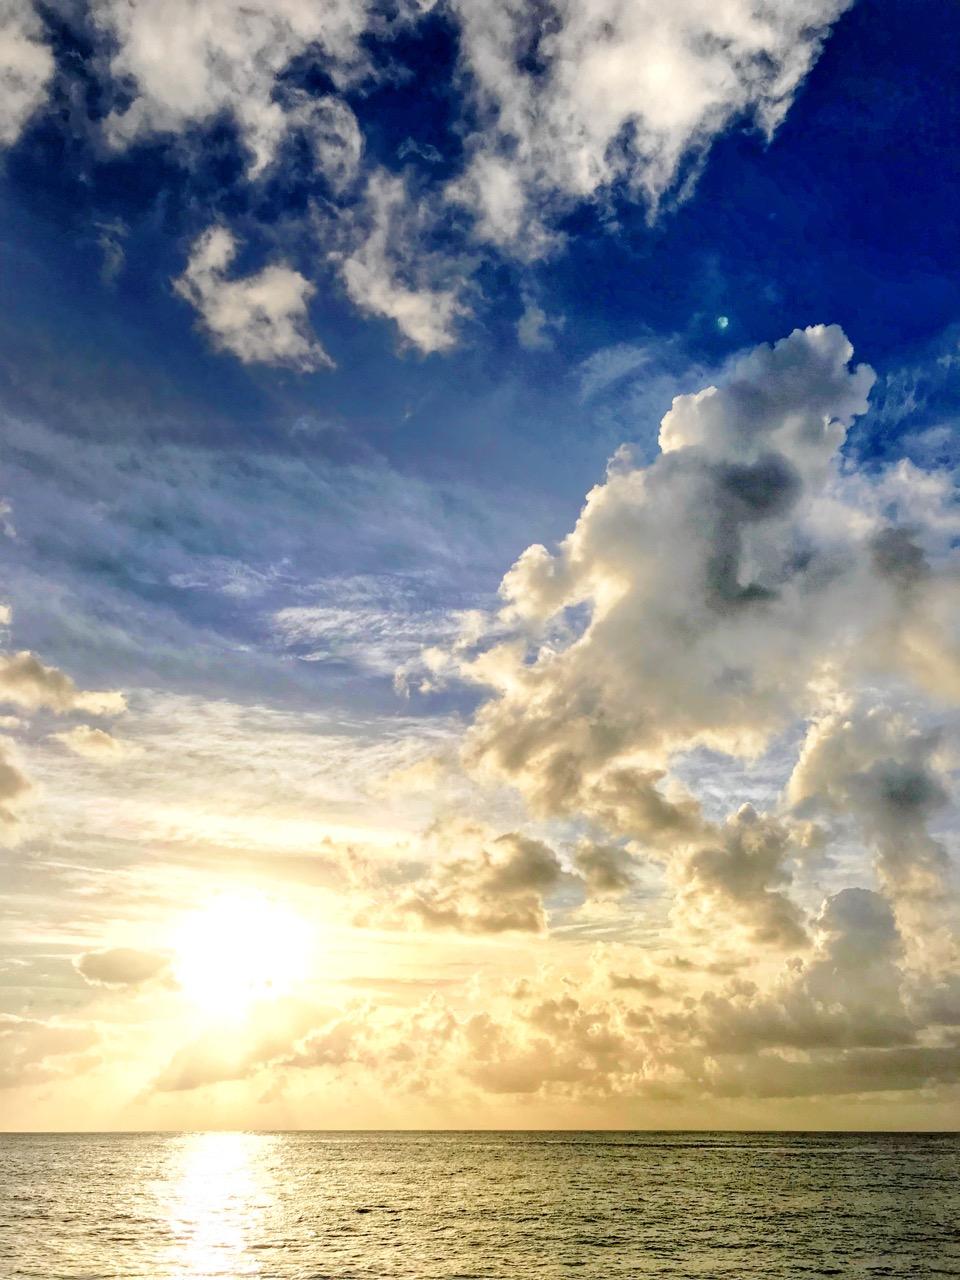 180524_OahuTrip_iPhone_Sunset.jpg